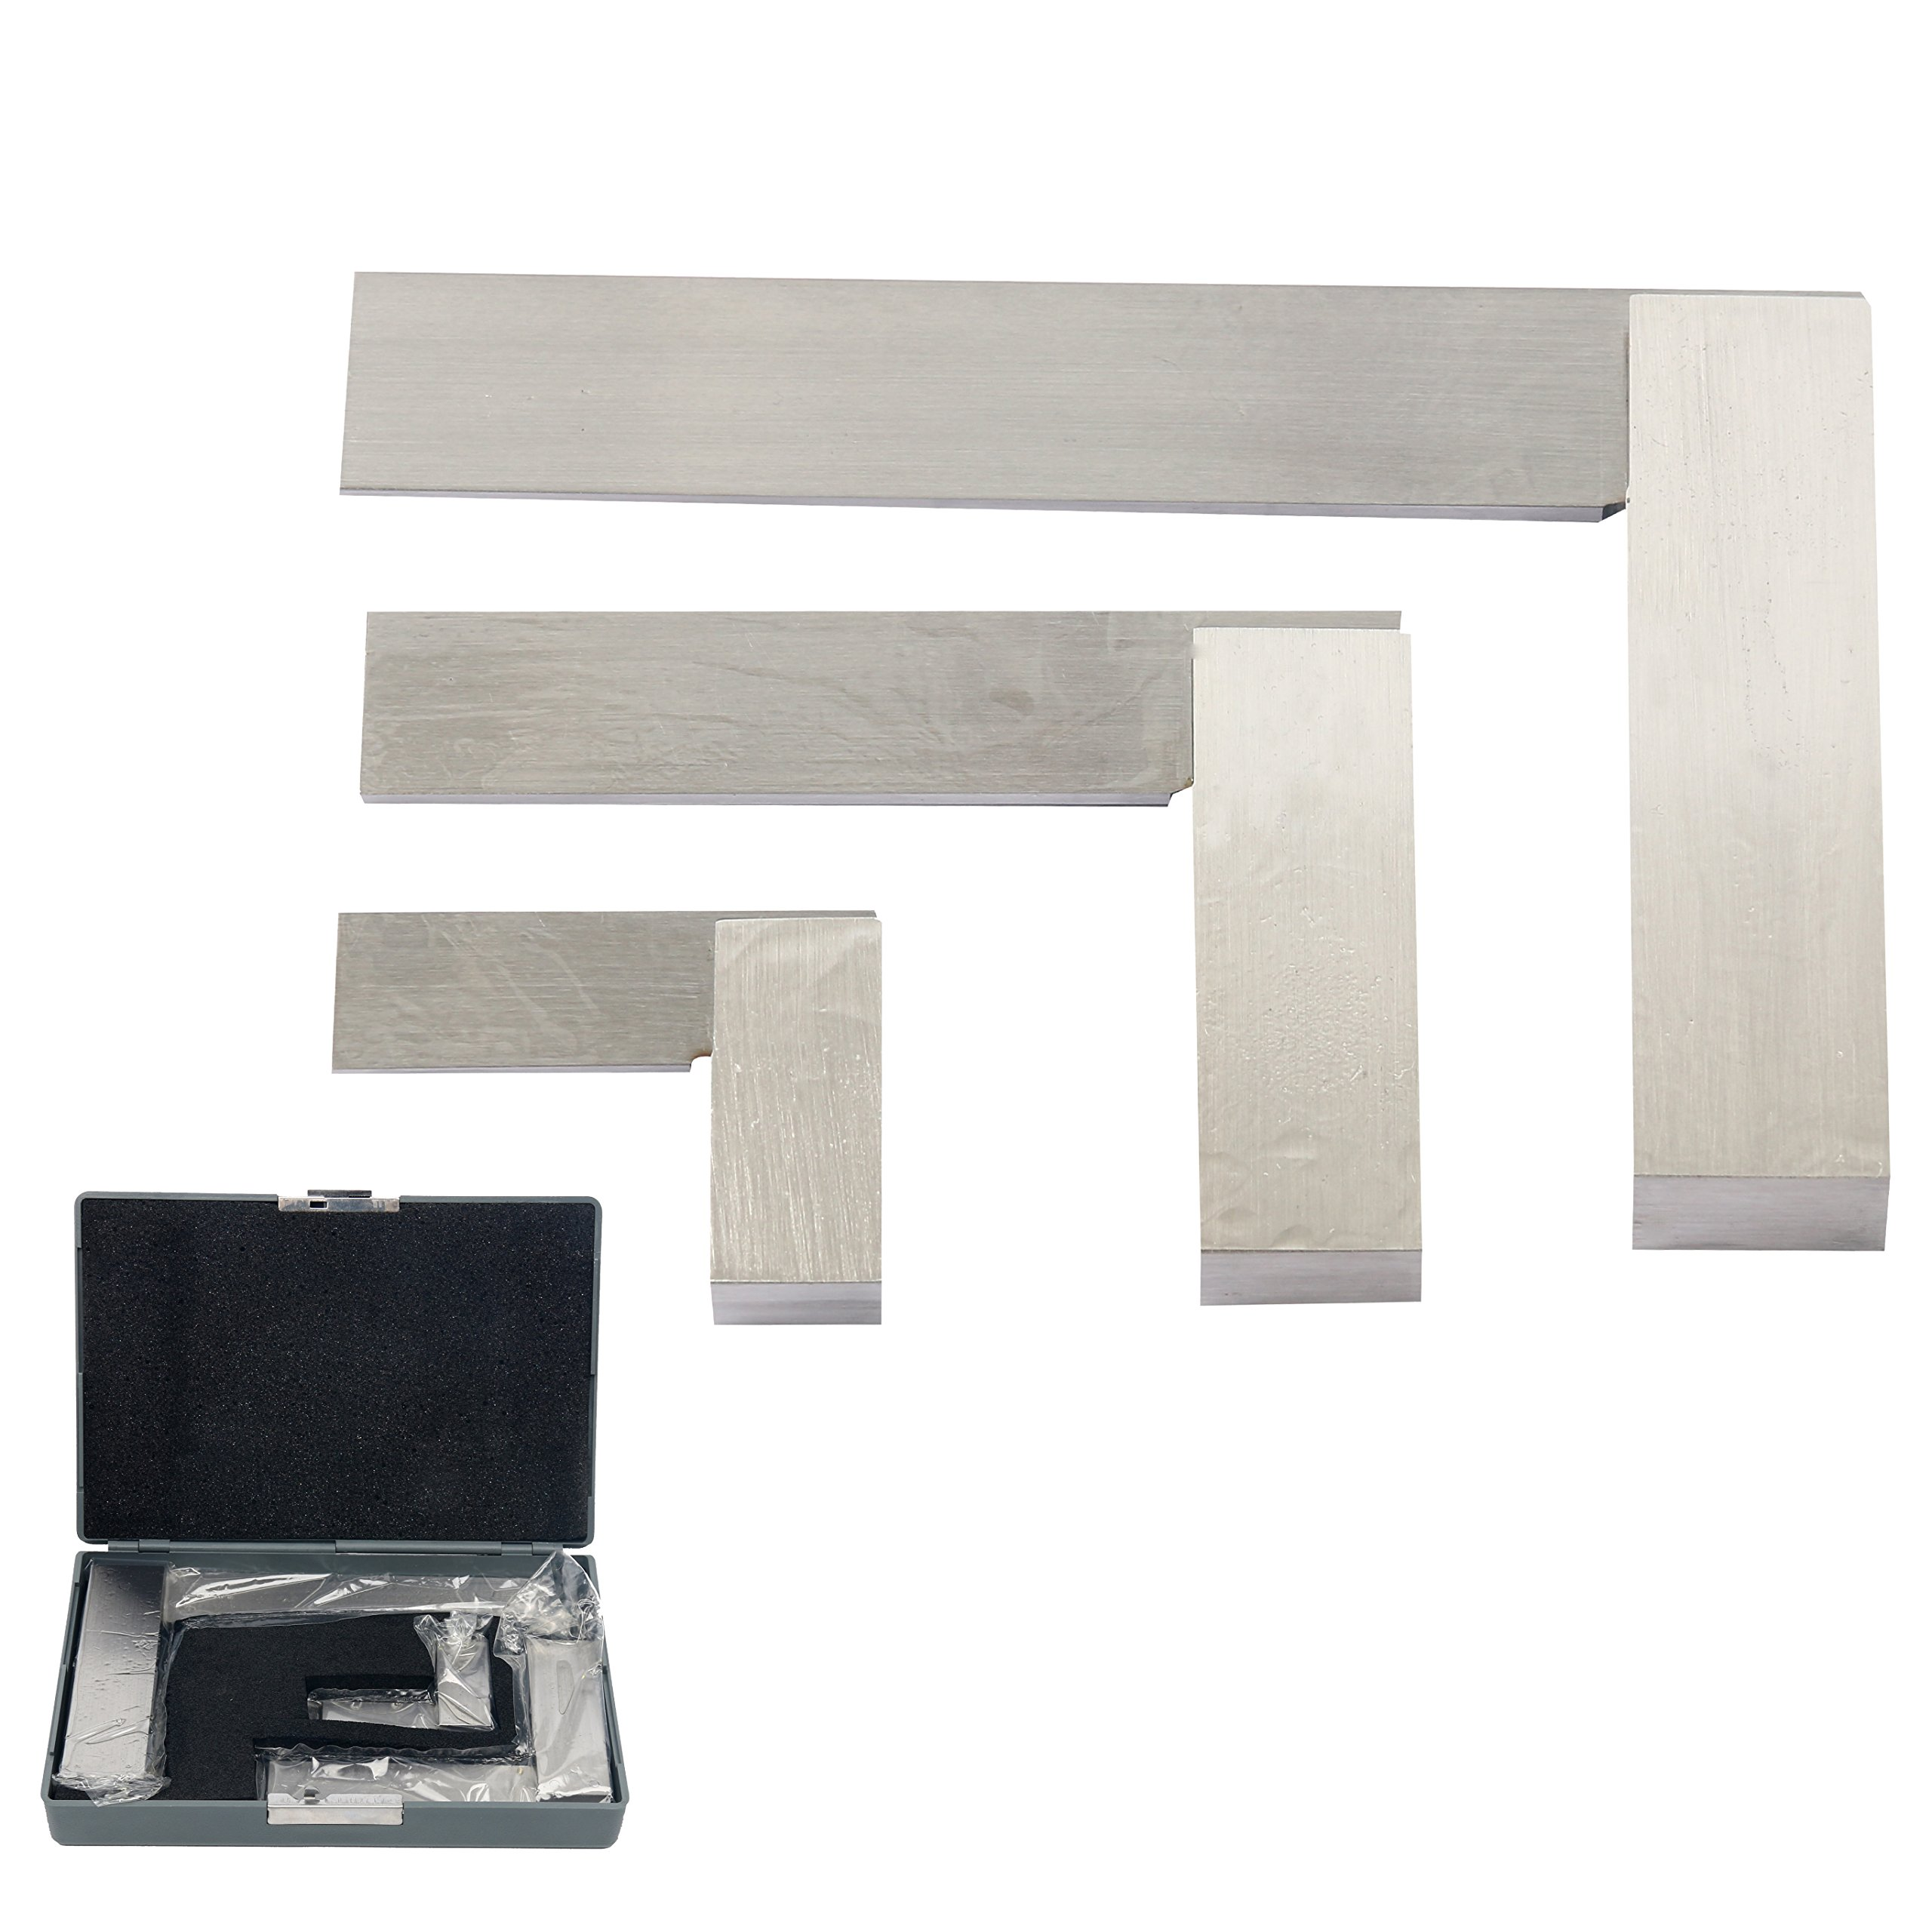 YaeTek Machinist Squares 90 Degree Right Angle Engineer's Set- 2'' 4'' 6'' DIN STANDARD 875, Machinist Square Set, 3-PIECE